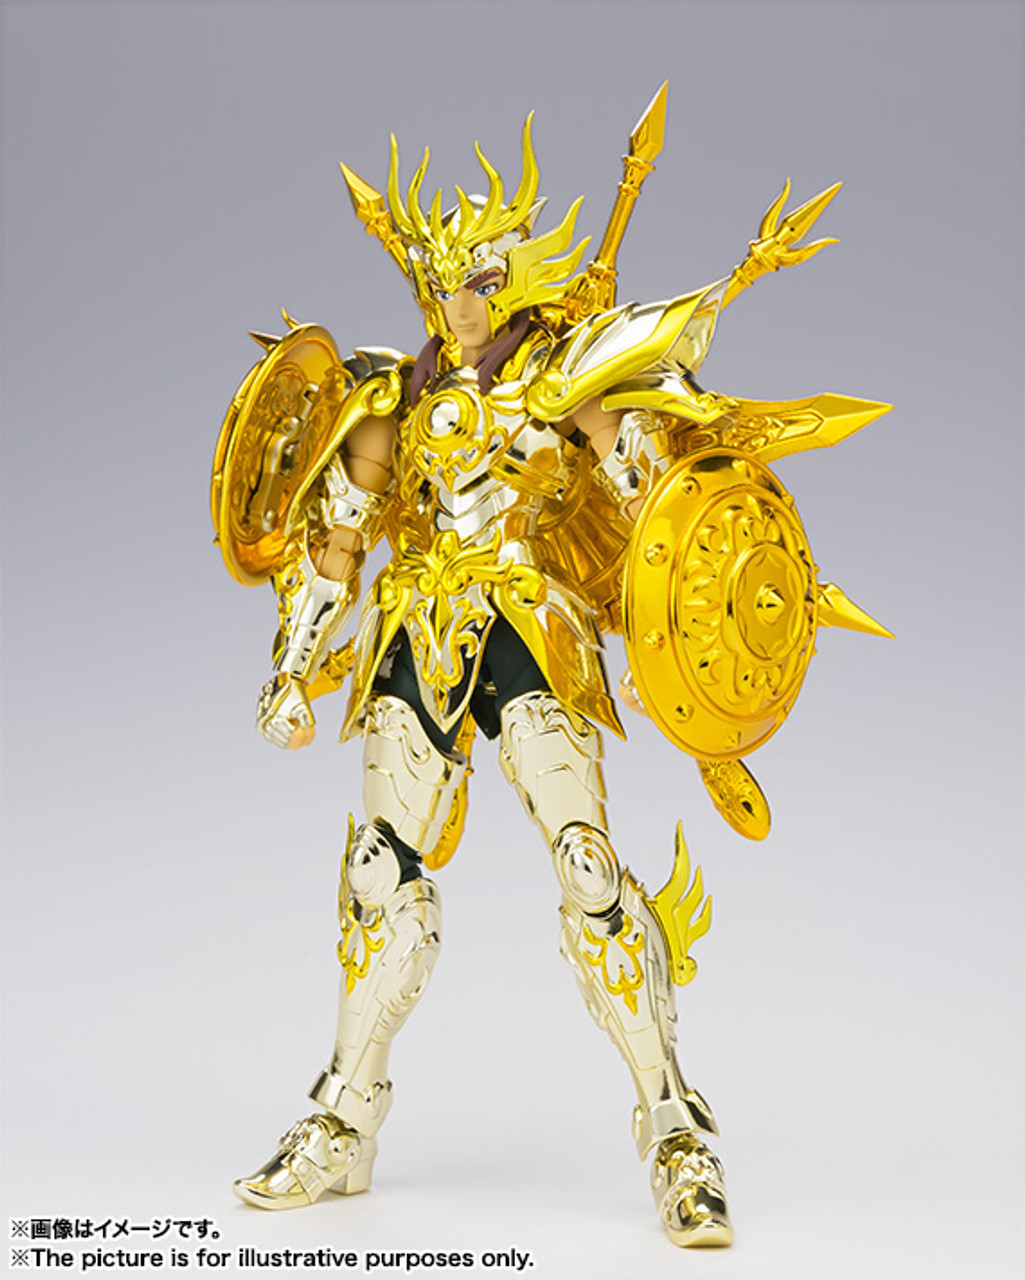 Saint Seiya Cloth Myth Ex Soul Of Gold God Libra Dohko Anime Action Figure New Animation Art Characters Japanese Anime